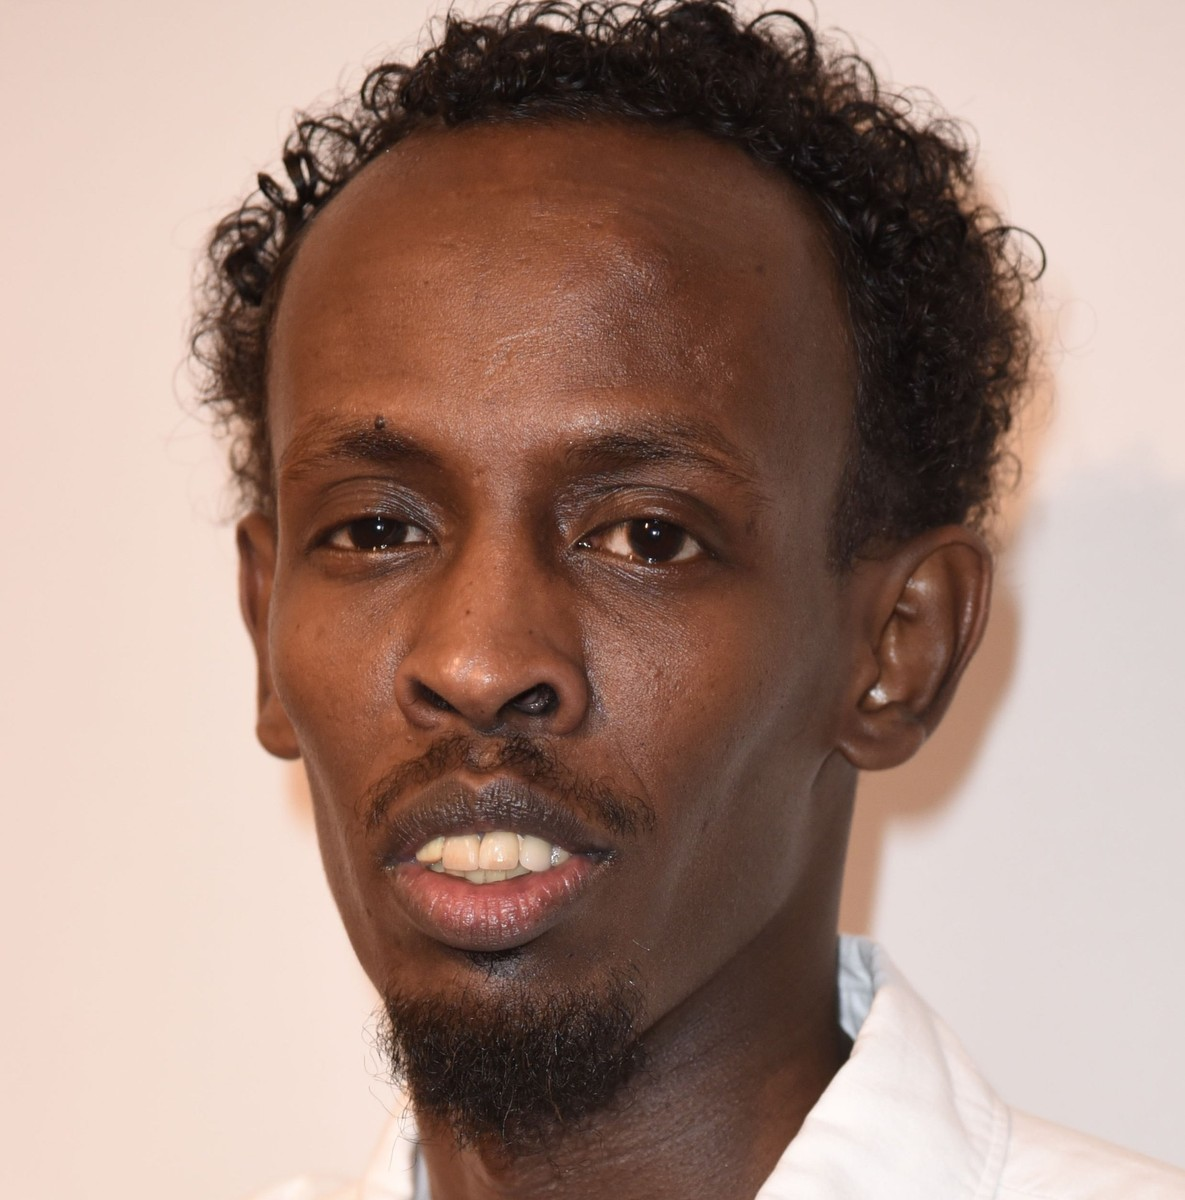 Barkhad Abdi Rotten Tomatoes